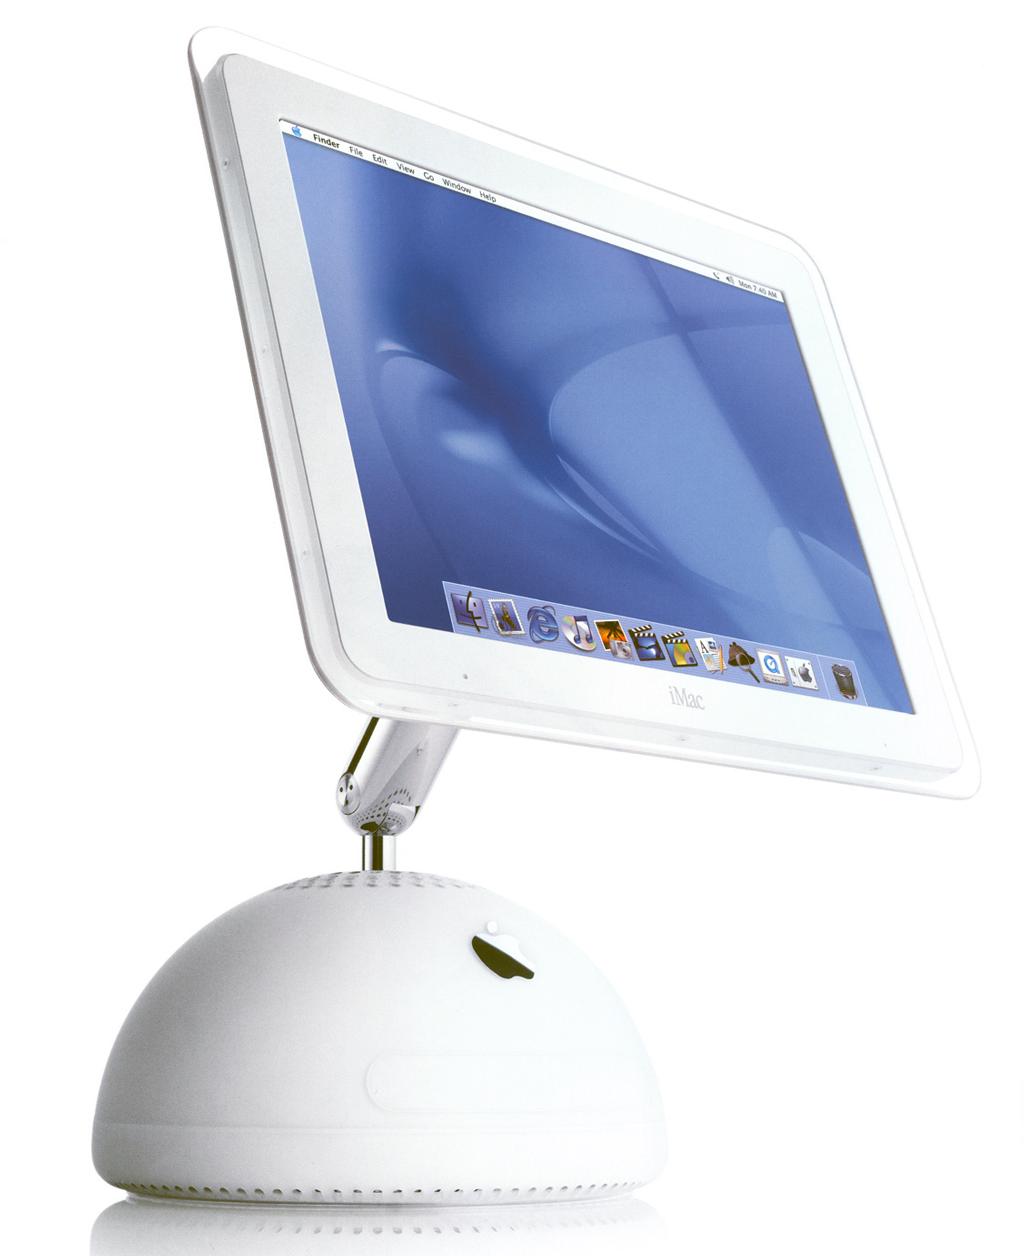 Imac Power G4 Modern And Elegant In Fashion Desktops & All-in-ones Apple Desktops & All-in-ones